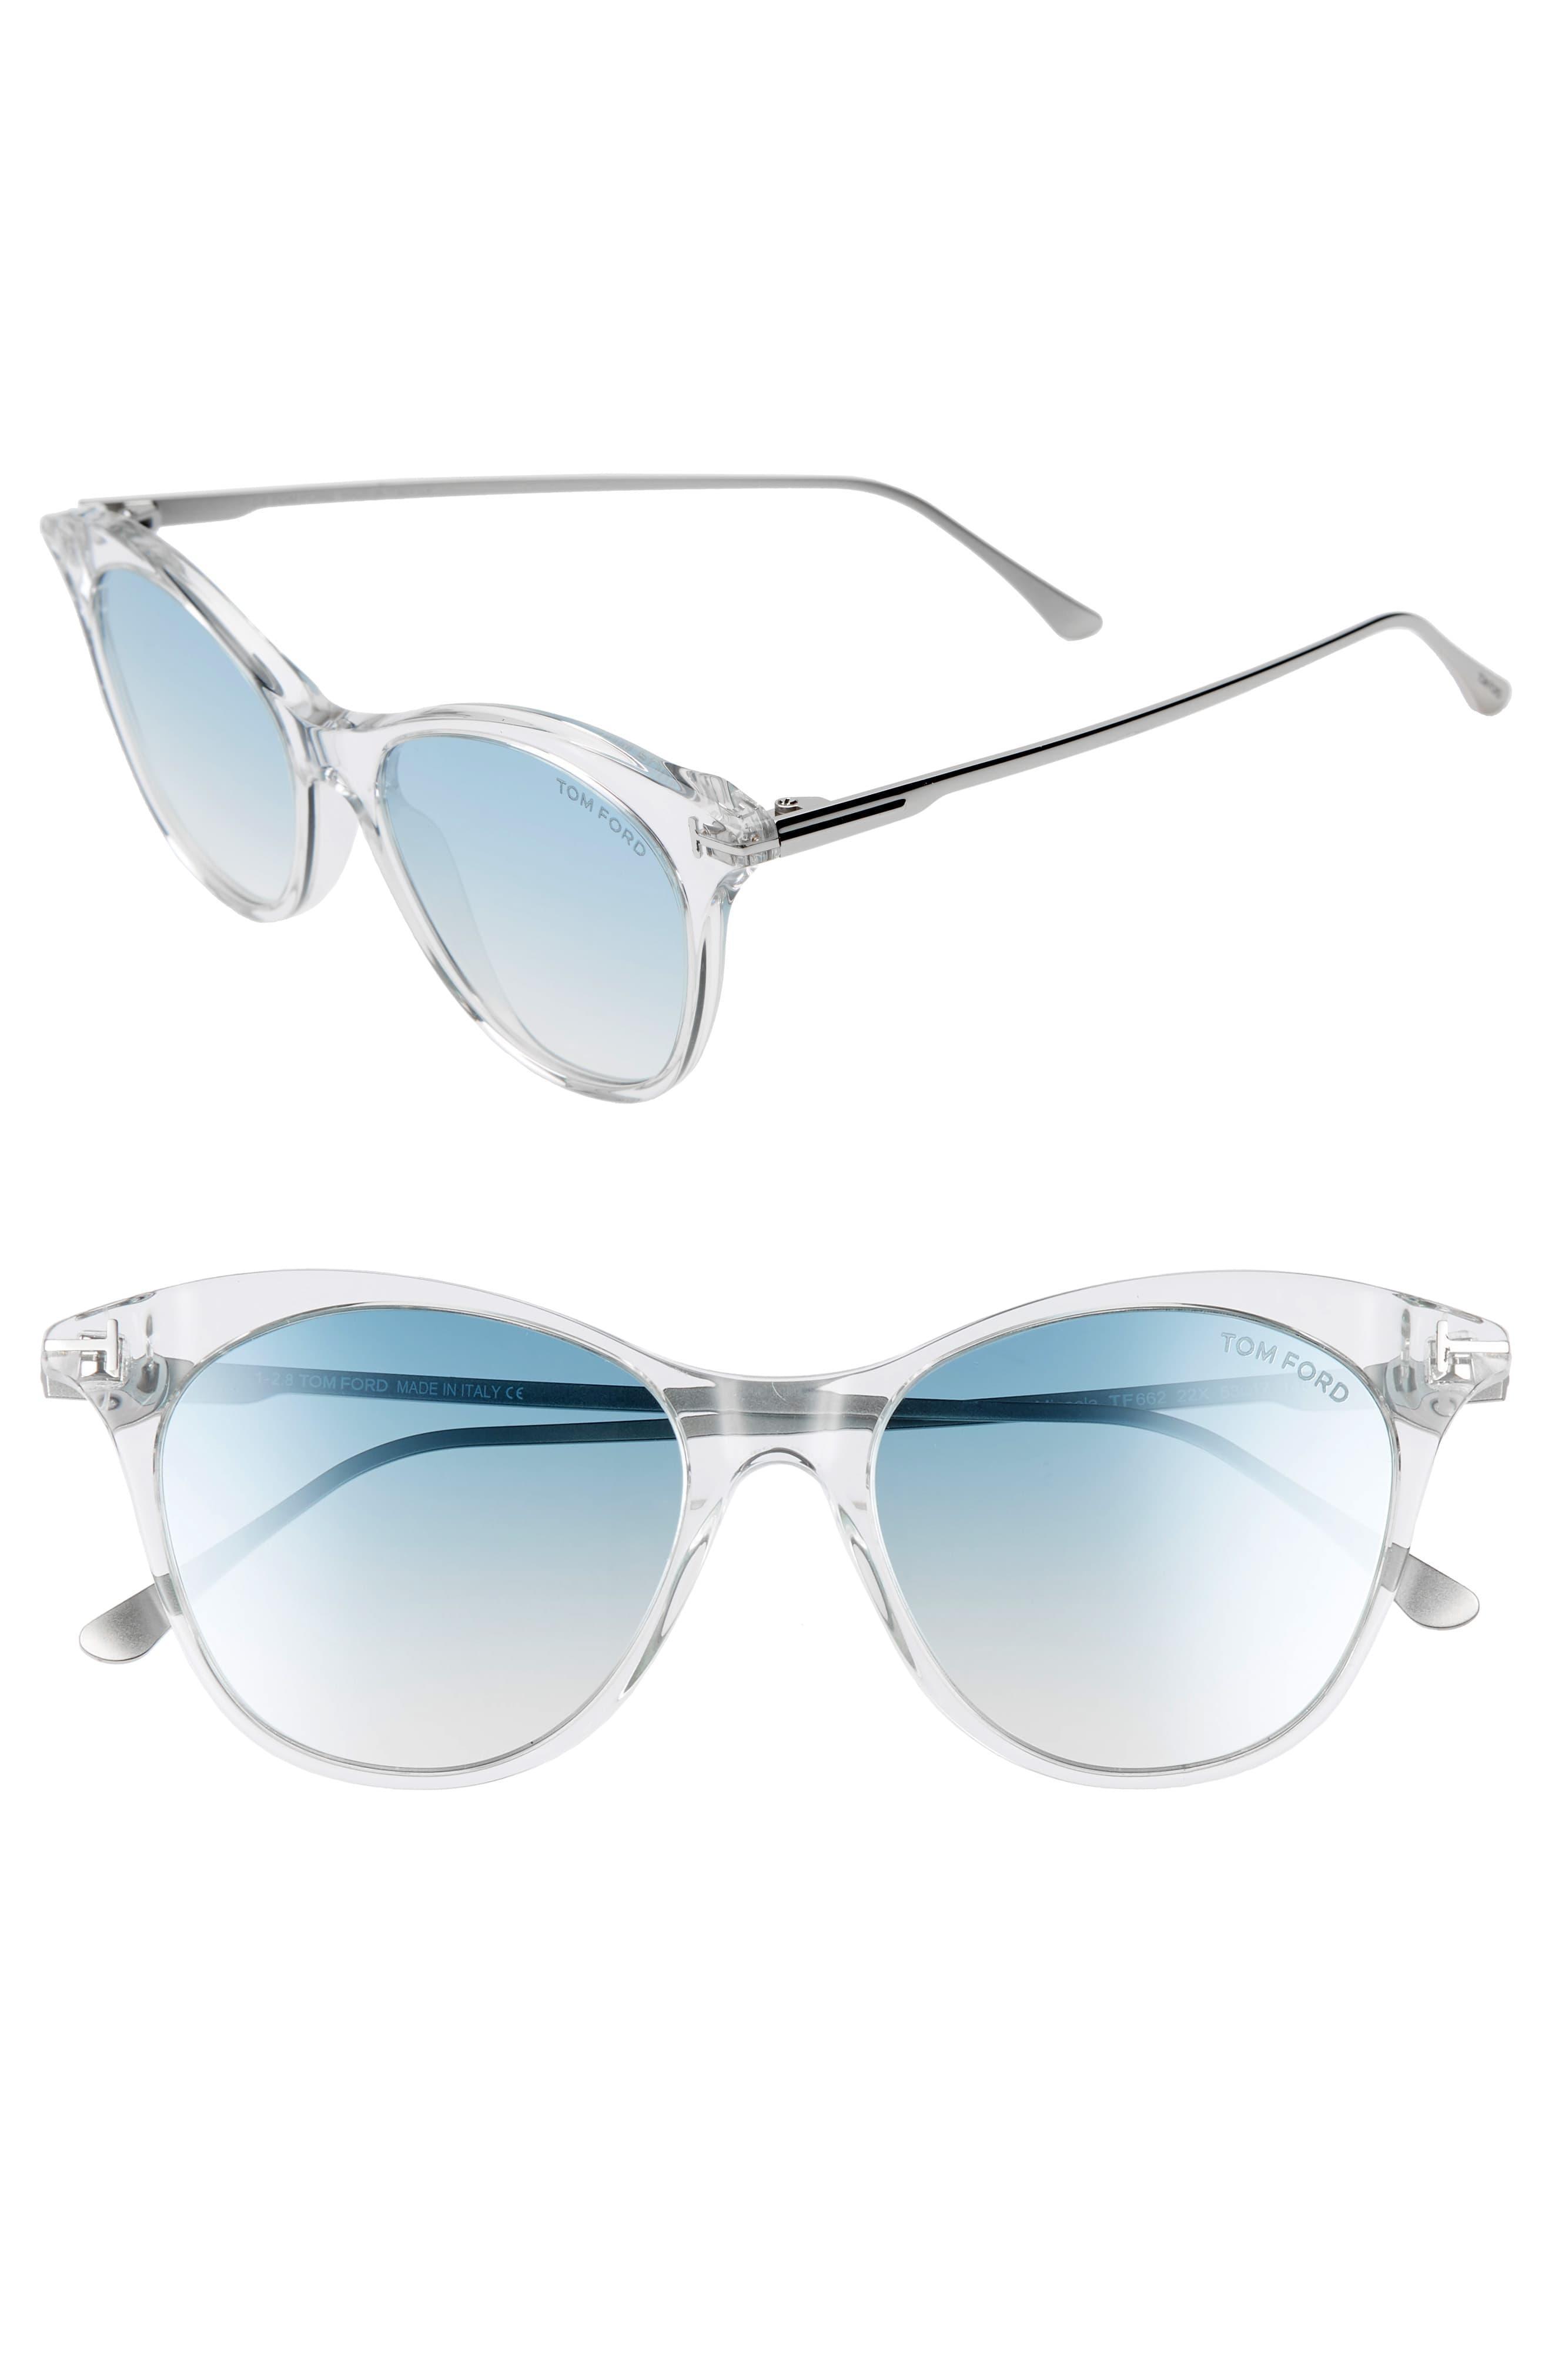 Micaela 53mm Cat Eye Sunglasses Champagne Rose Gld Brwn Silv